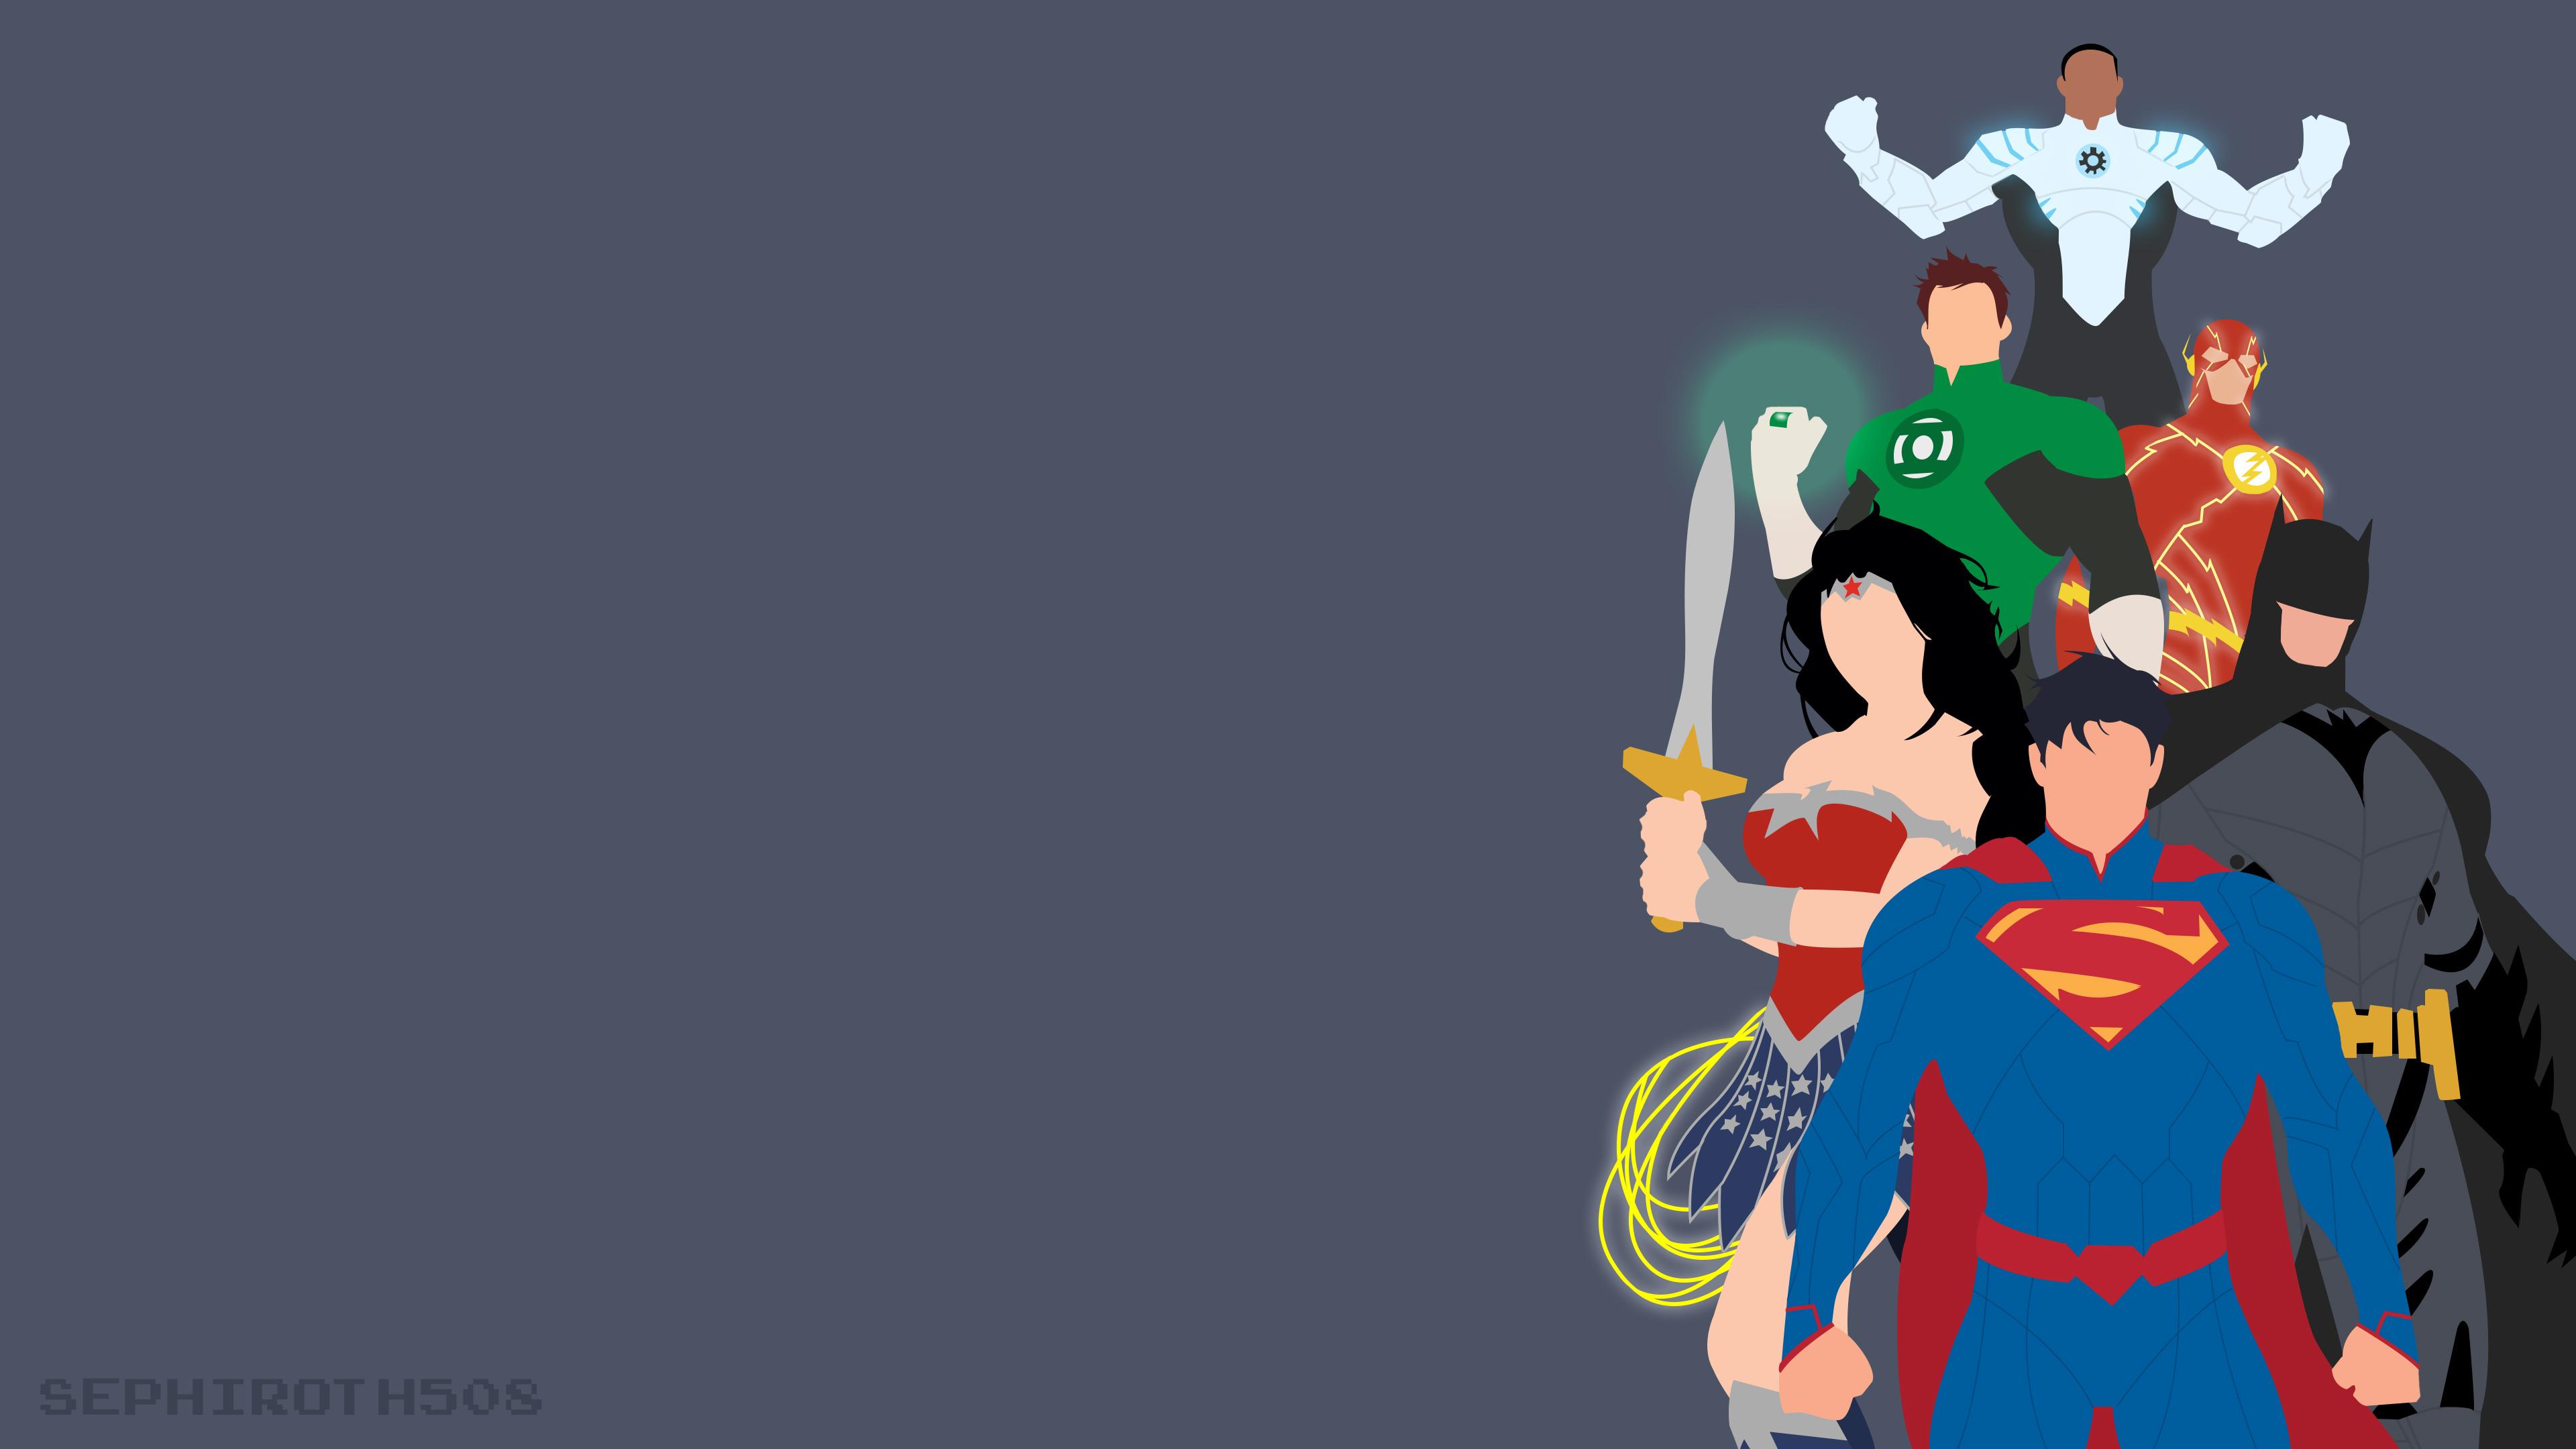 justice league minimalist 1536518594 - Justice League Minimalist - wonder woman wallpapers, superman wallpapers, minimalism wallpapers, justice league wallpapers, hd-wallpapers, green lantern wallpapers, flash wallpapers, deviantart wallpapers, cyborg wallpapers, batman wallpapers, artist wallpapers, 4k-wallpapers